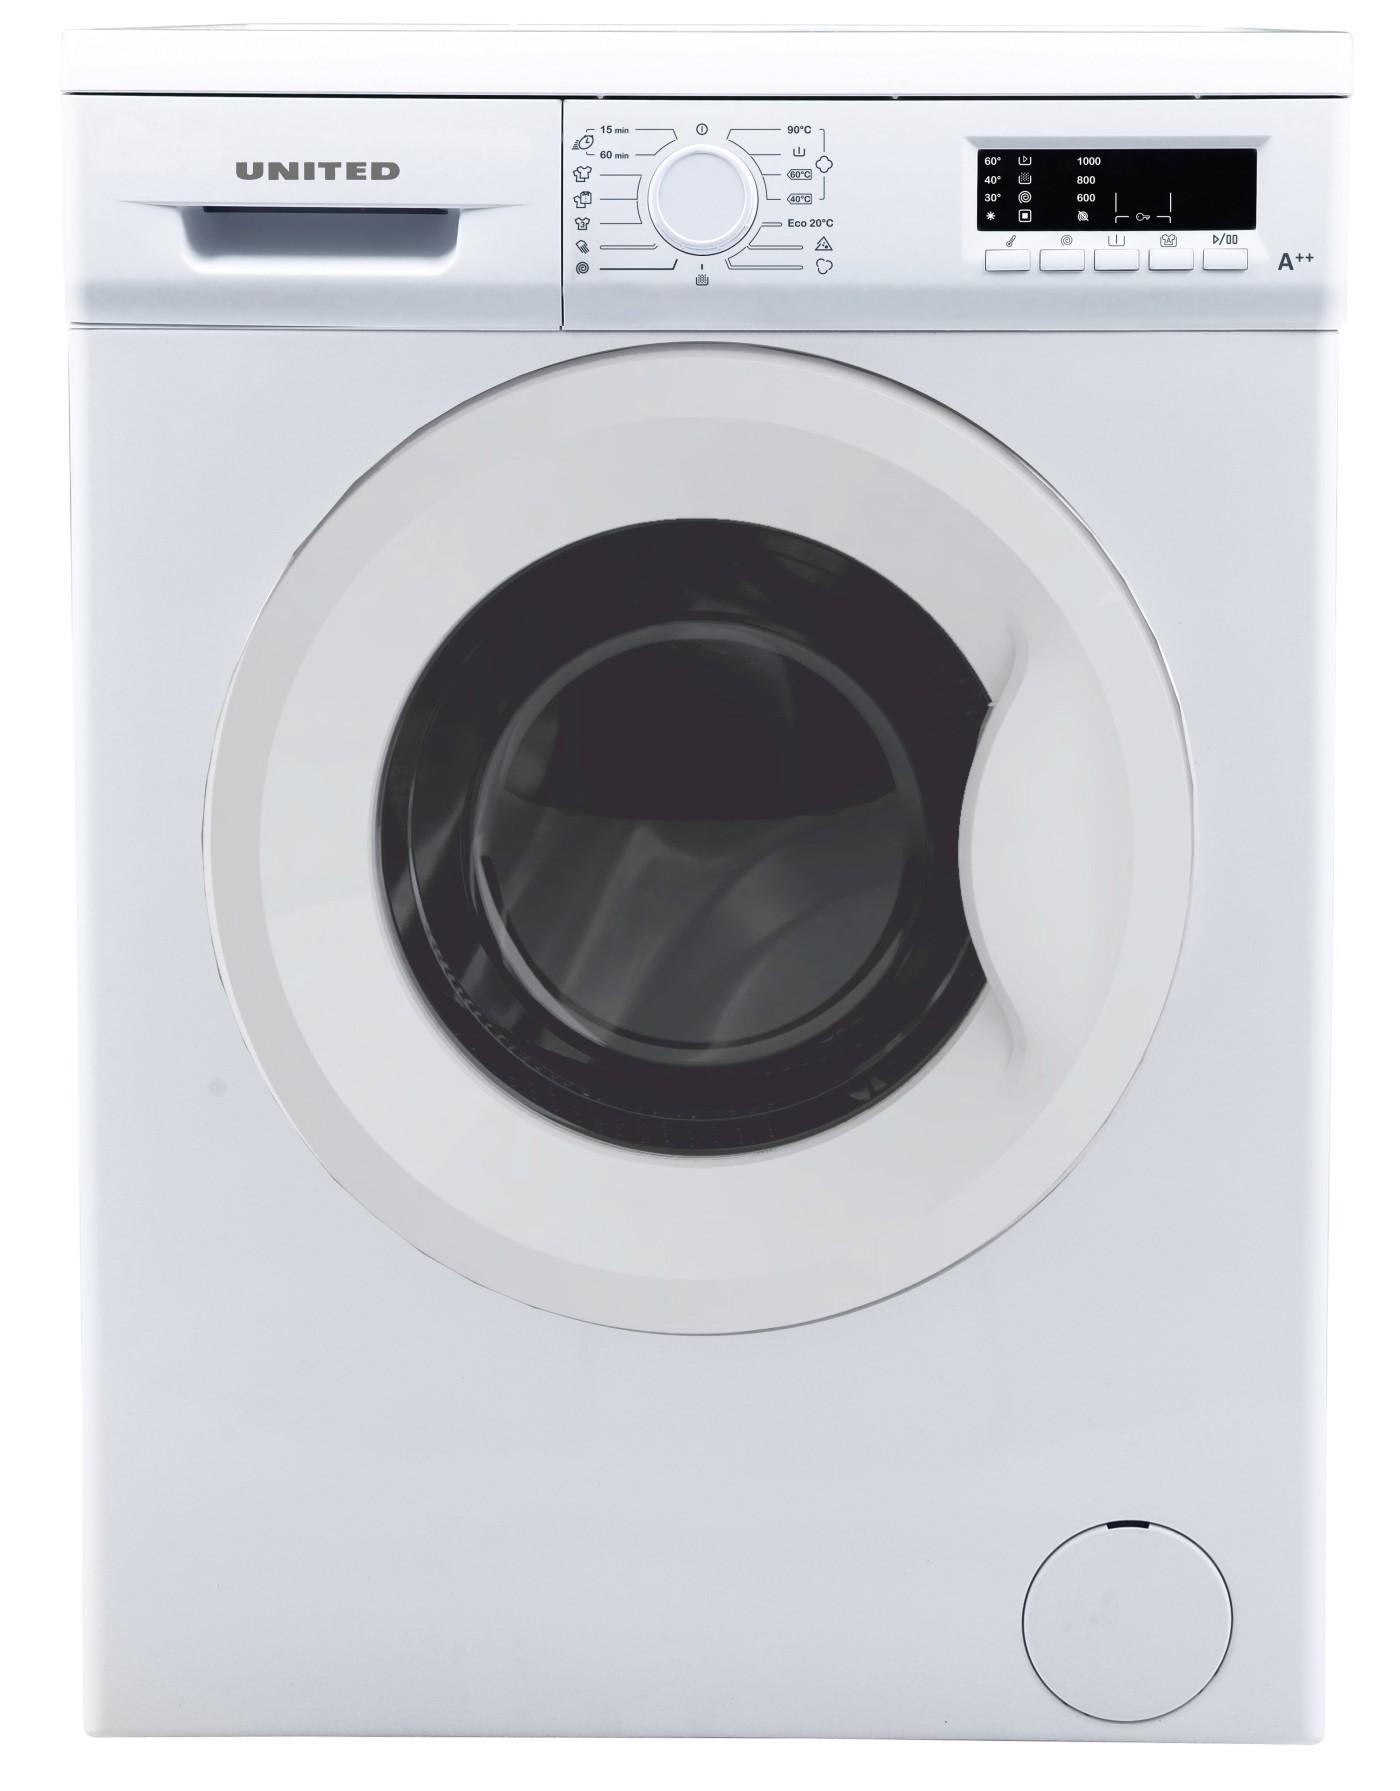 UNITED UWM-9106 ΠΛΥΝΤΗΡΙΟ ΡΟΥΧΩΝ 9KG 53cdc046e8e